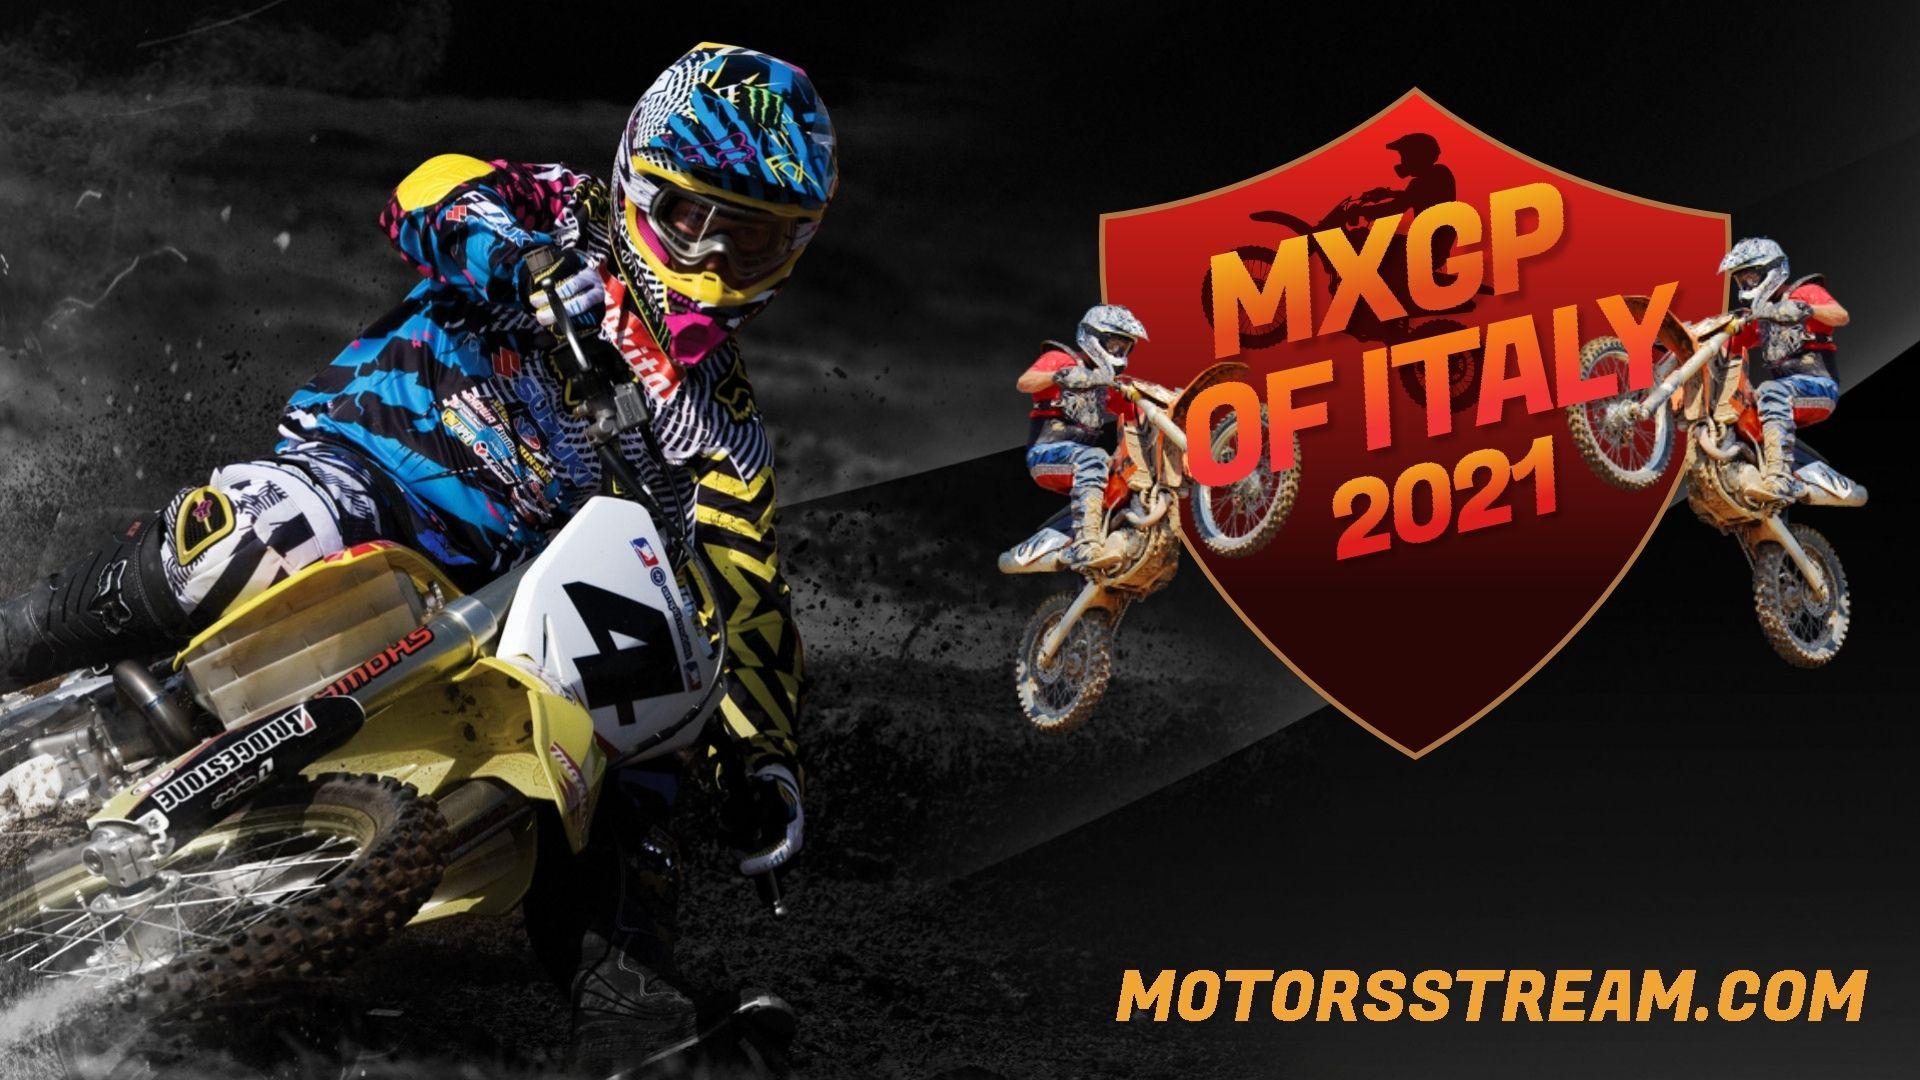 FIM Motocross WC Italy Live Stream 2021 | MXGP